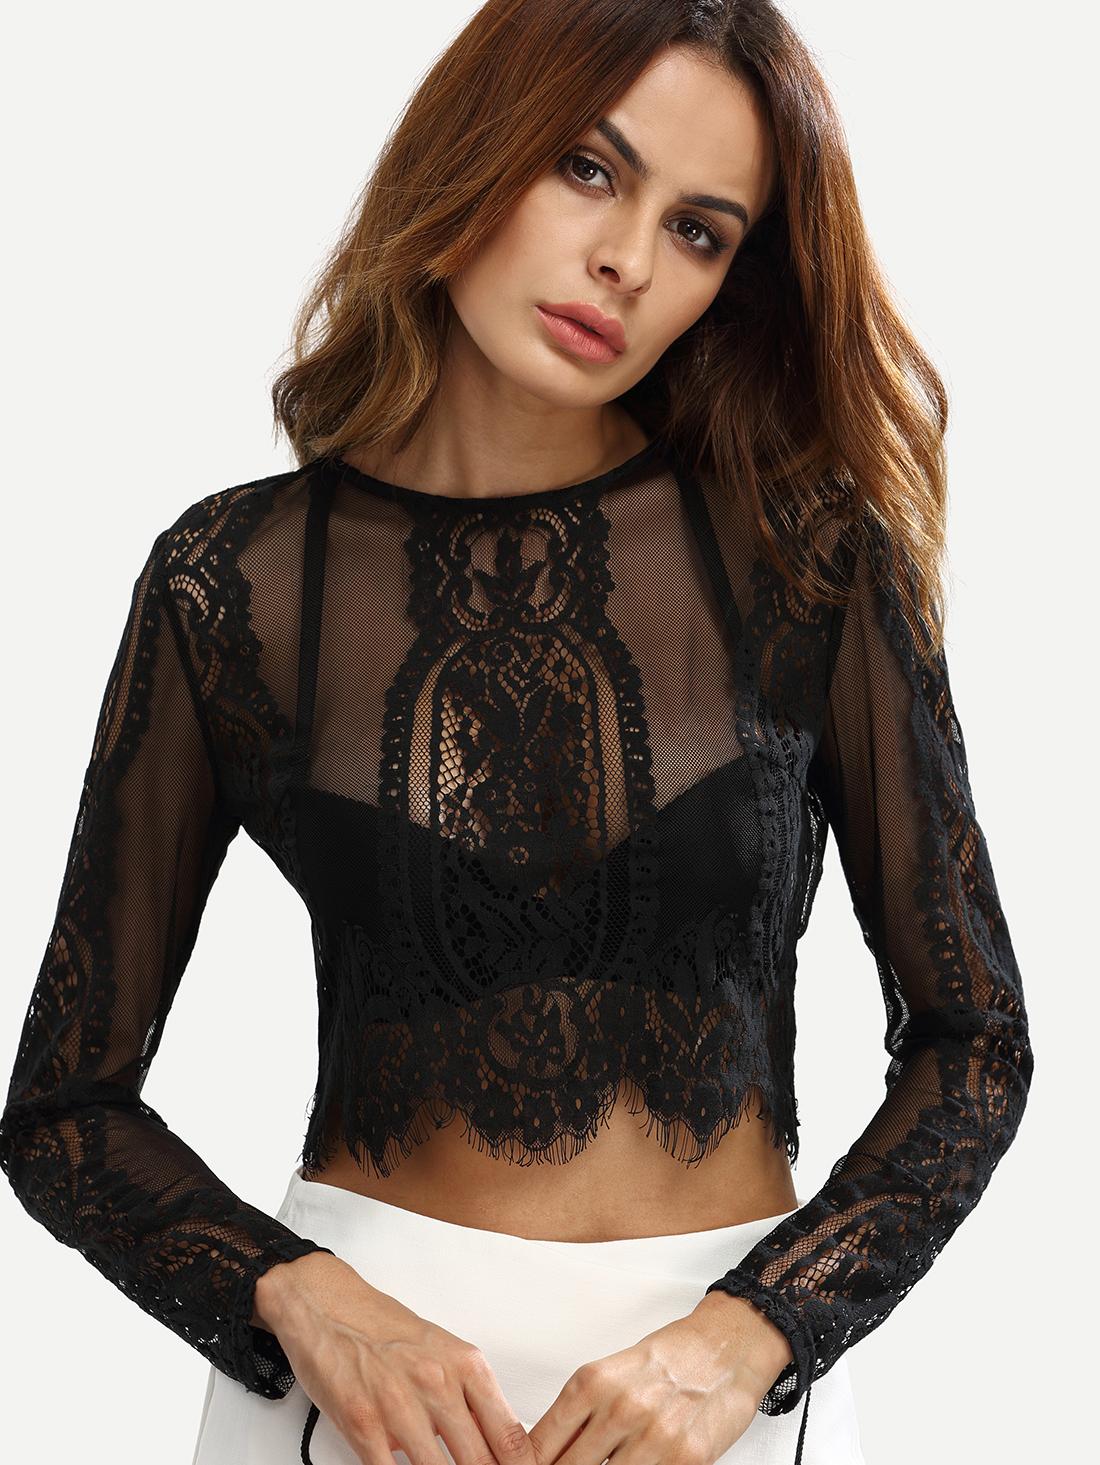 Top Blouse Shirt Sheer Ladies Lace Look Dipped Hem New Womens Fashion Black Net